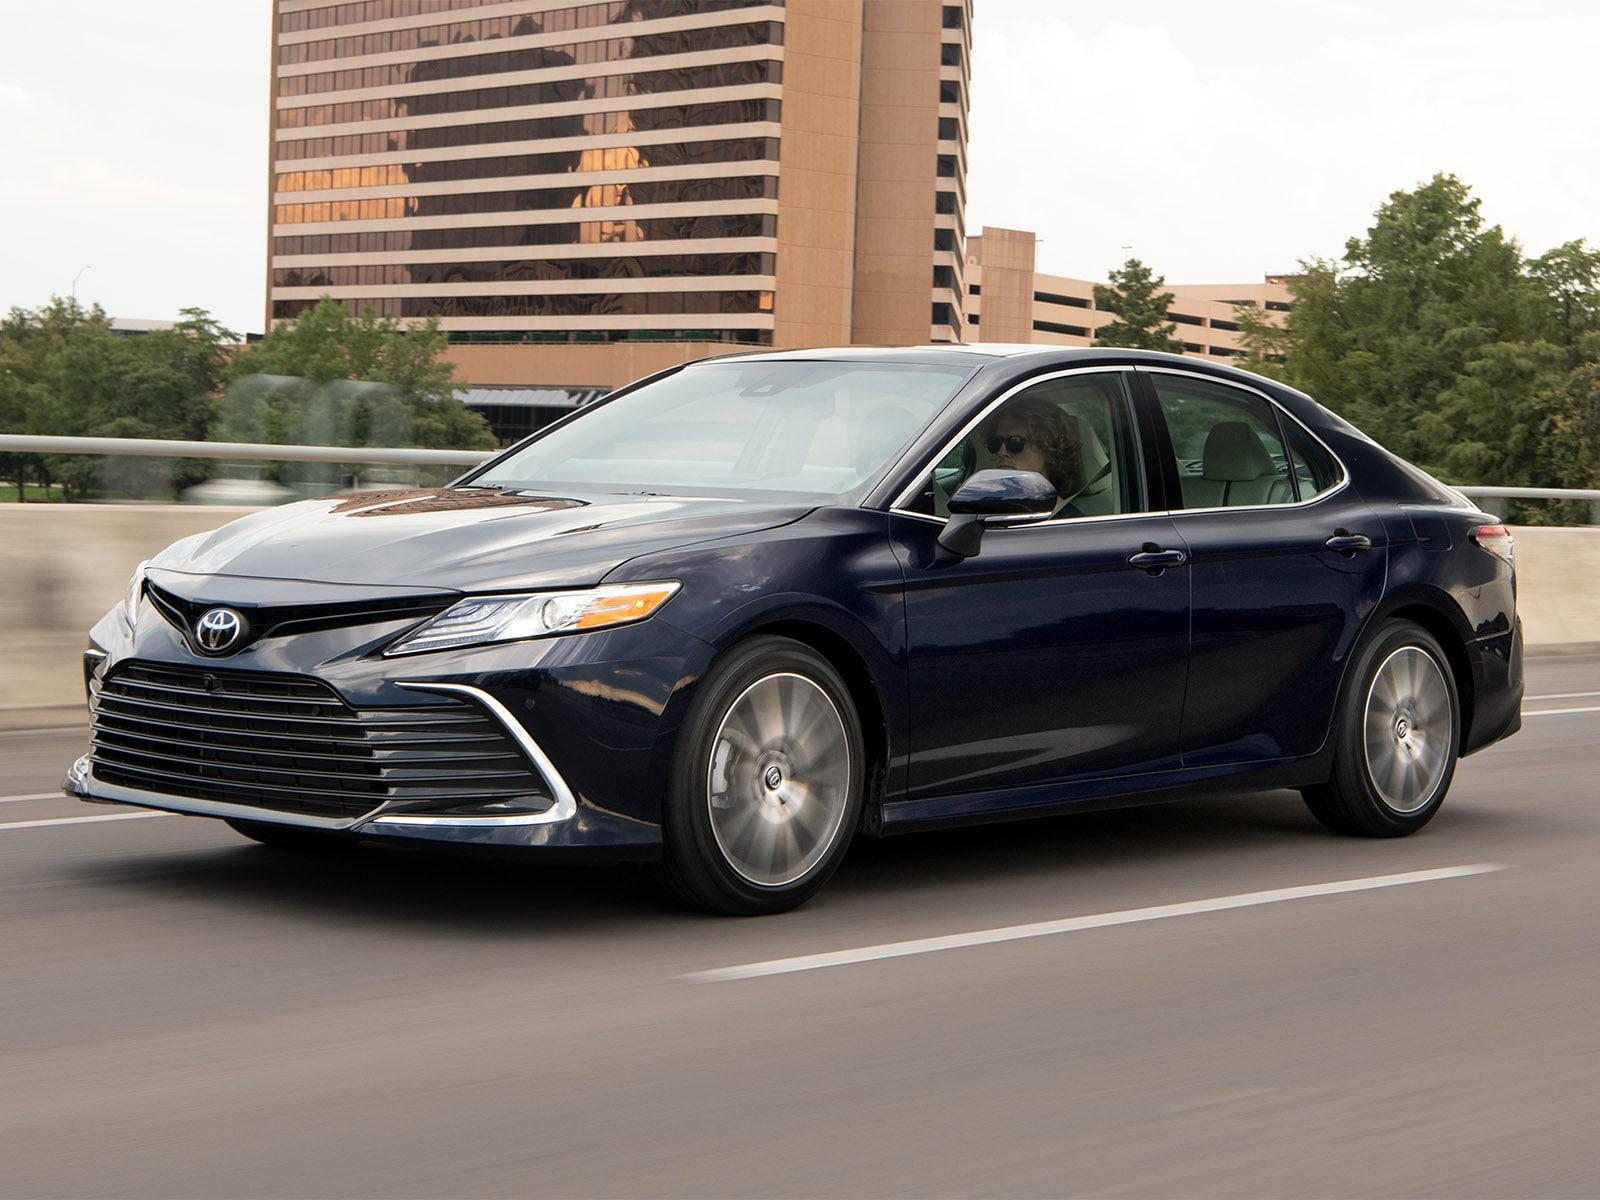 10 Best Memorial Day Car Deals for 2021